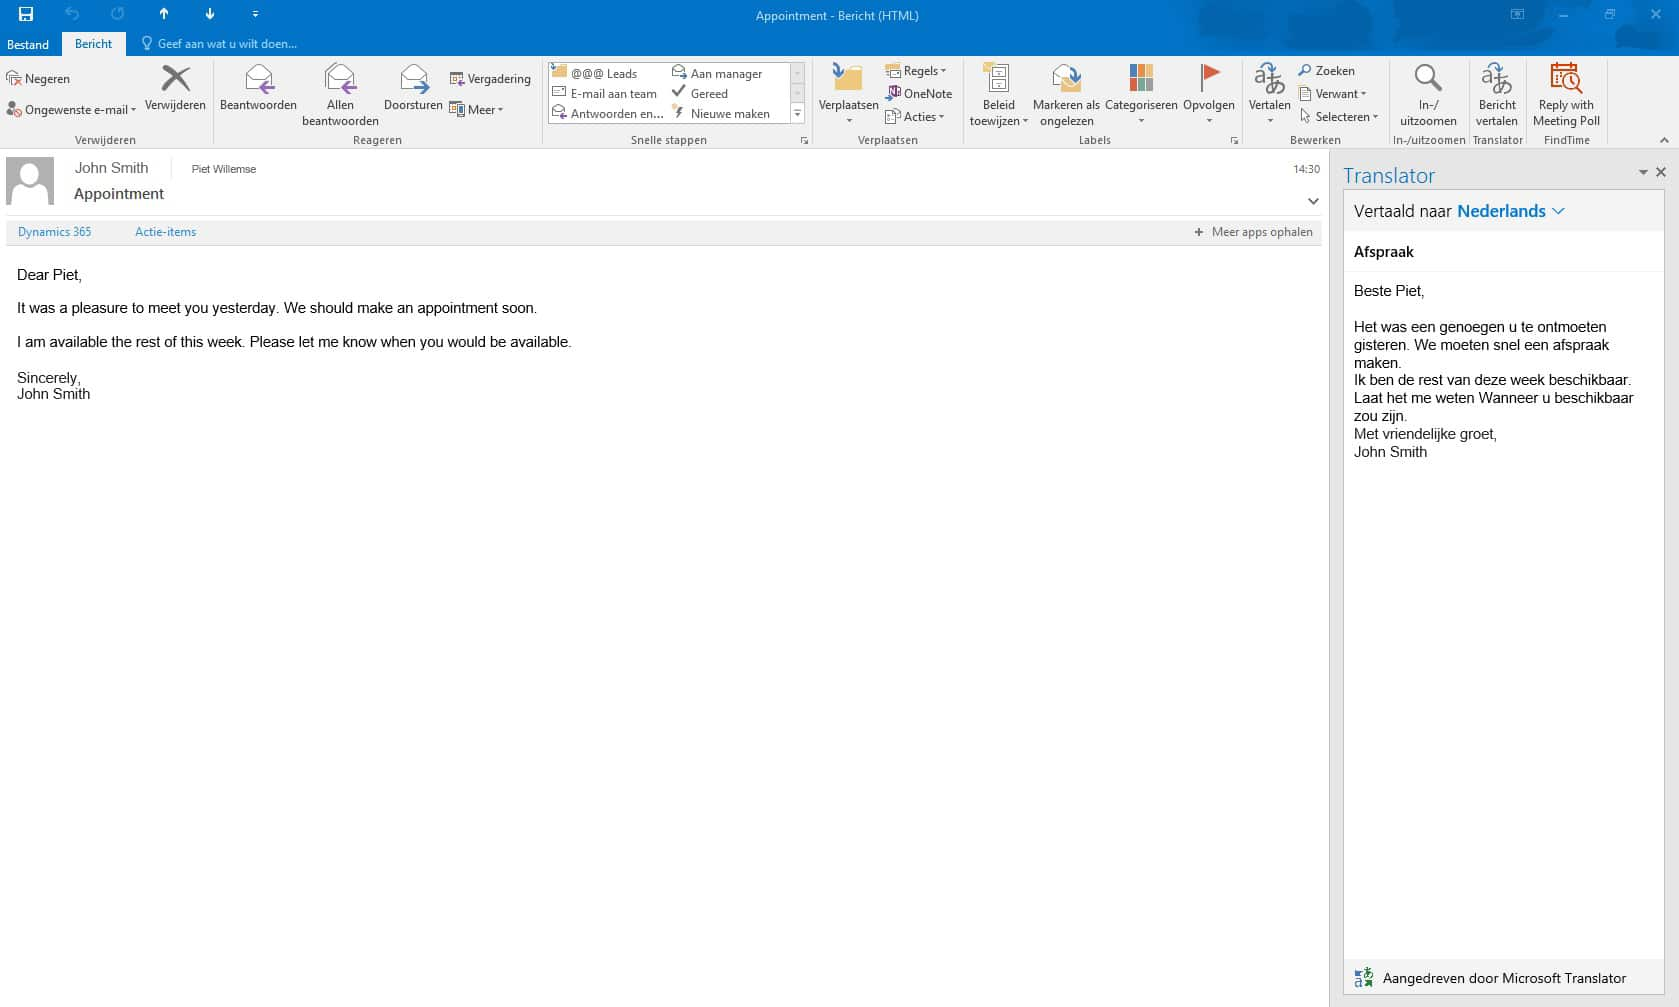 Translator for Outlook - Integratie in Outlook